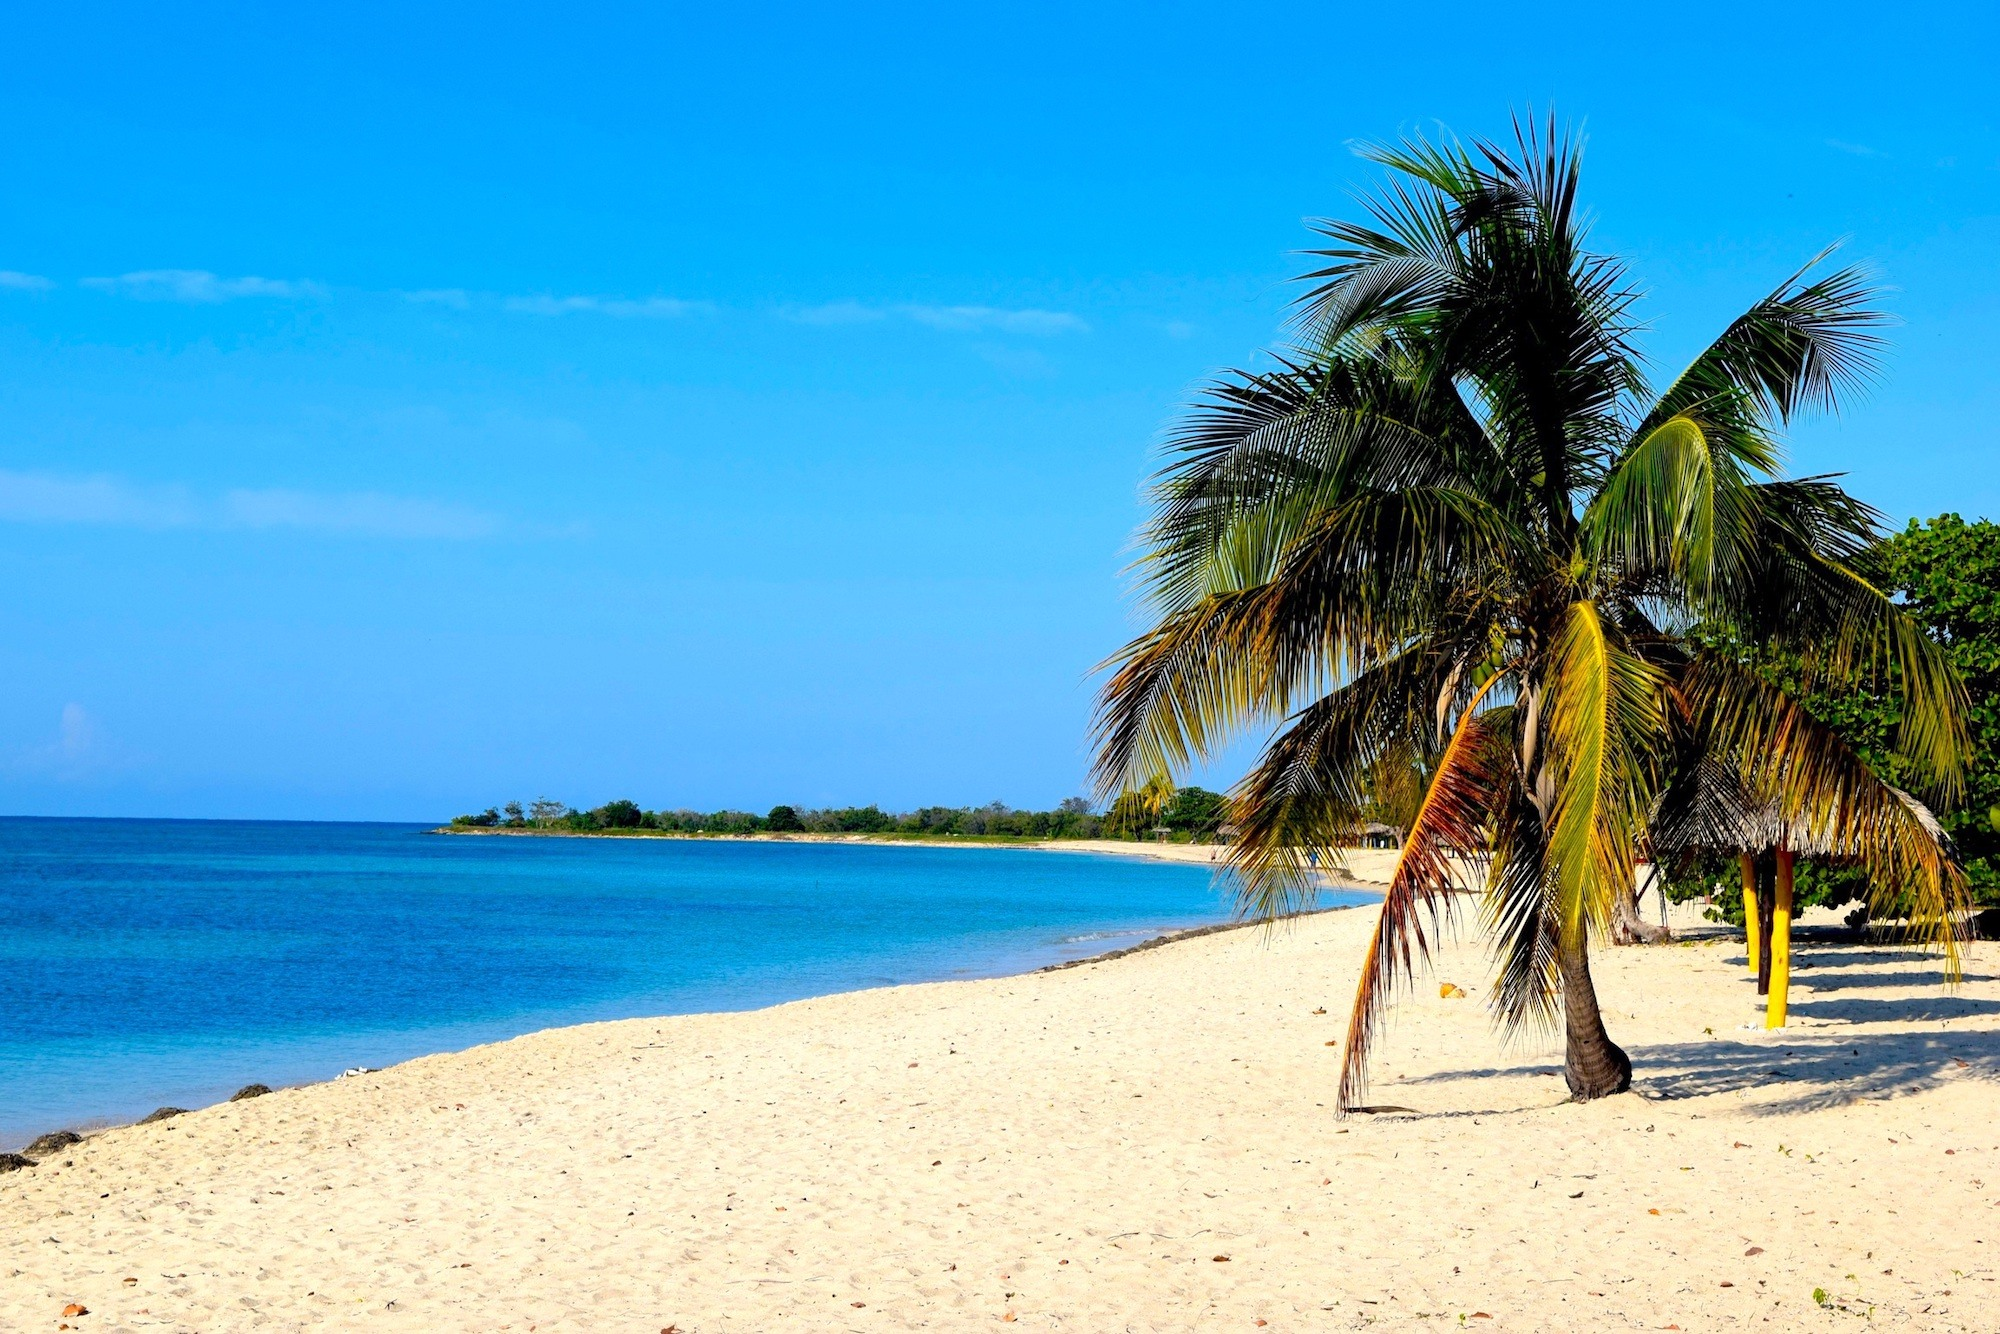 Cuba Beach & Palm Trees